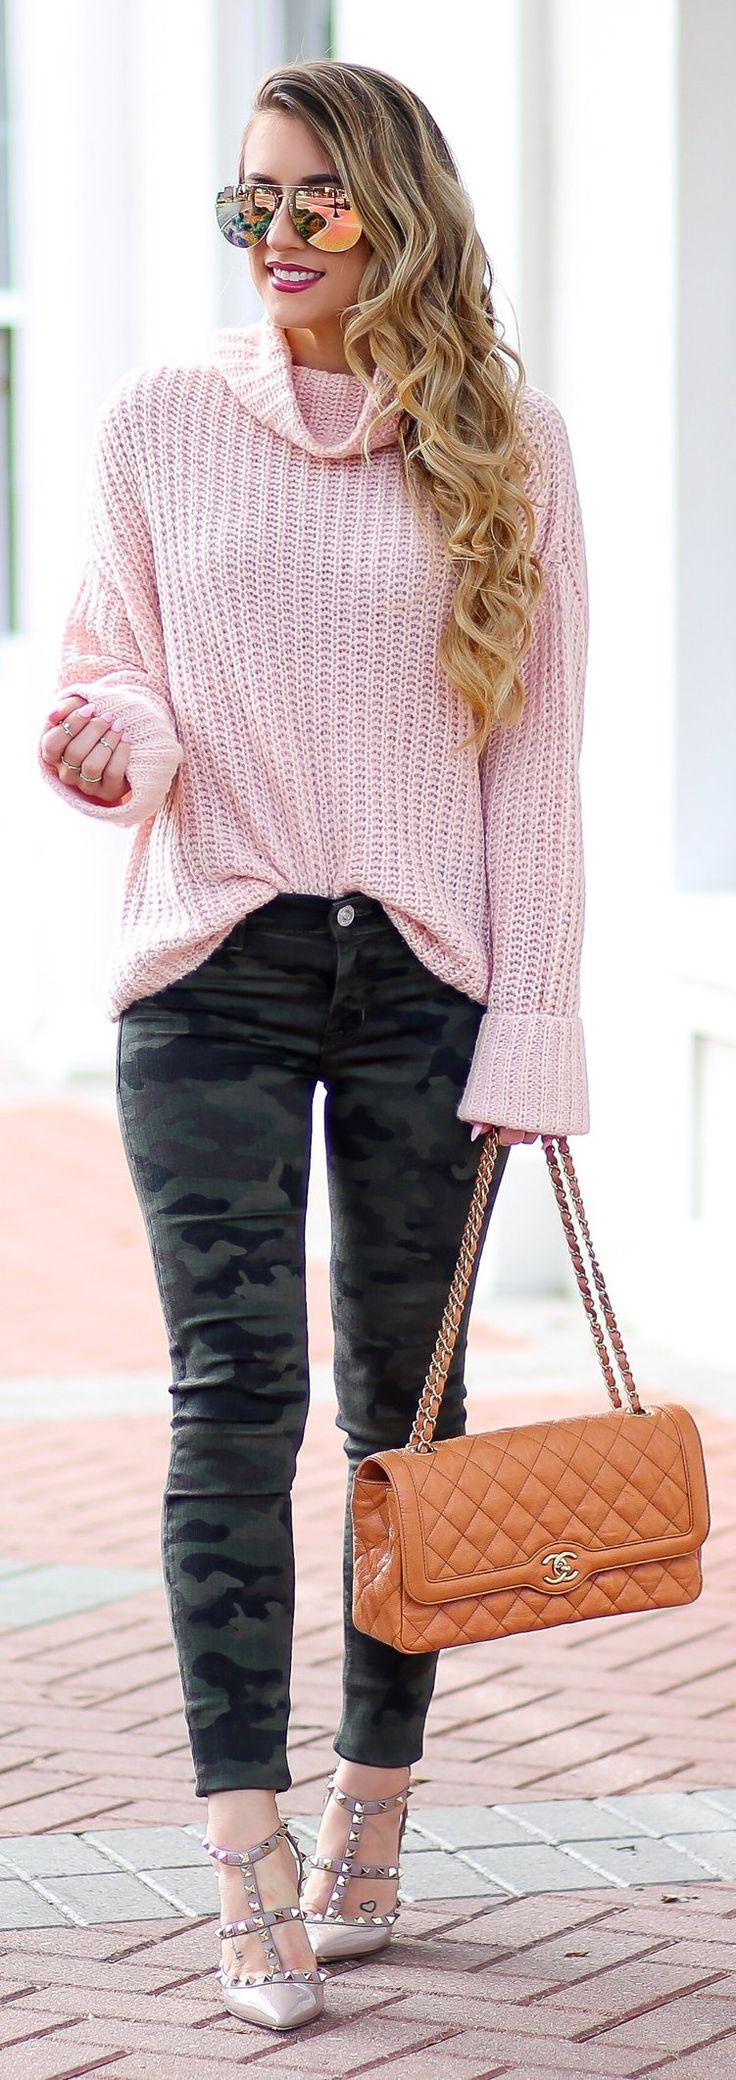 #winter #fashion /  Pink Turtleneck / Camo Skinny Pants / Brown Quilted Shoulder / Studded Pumps